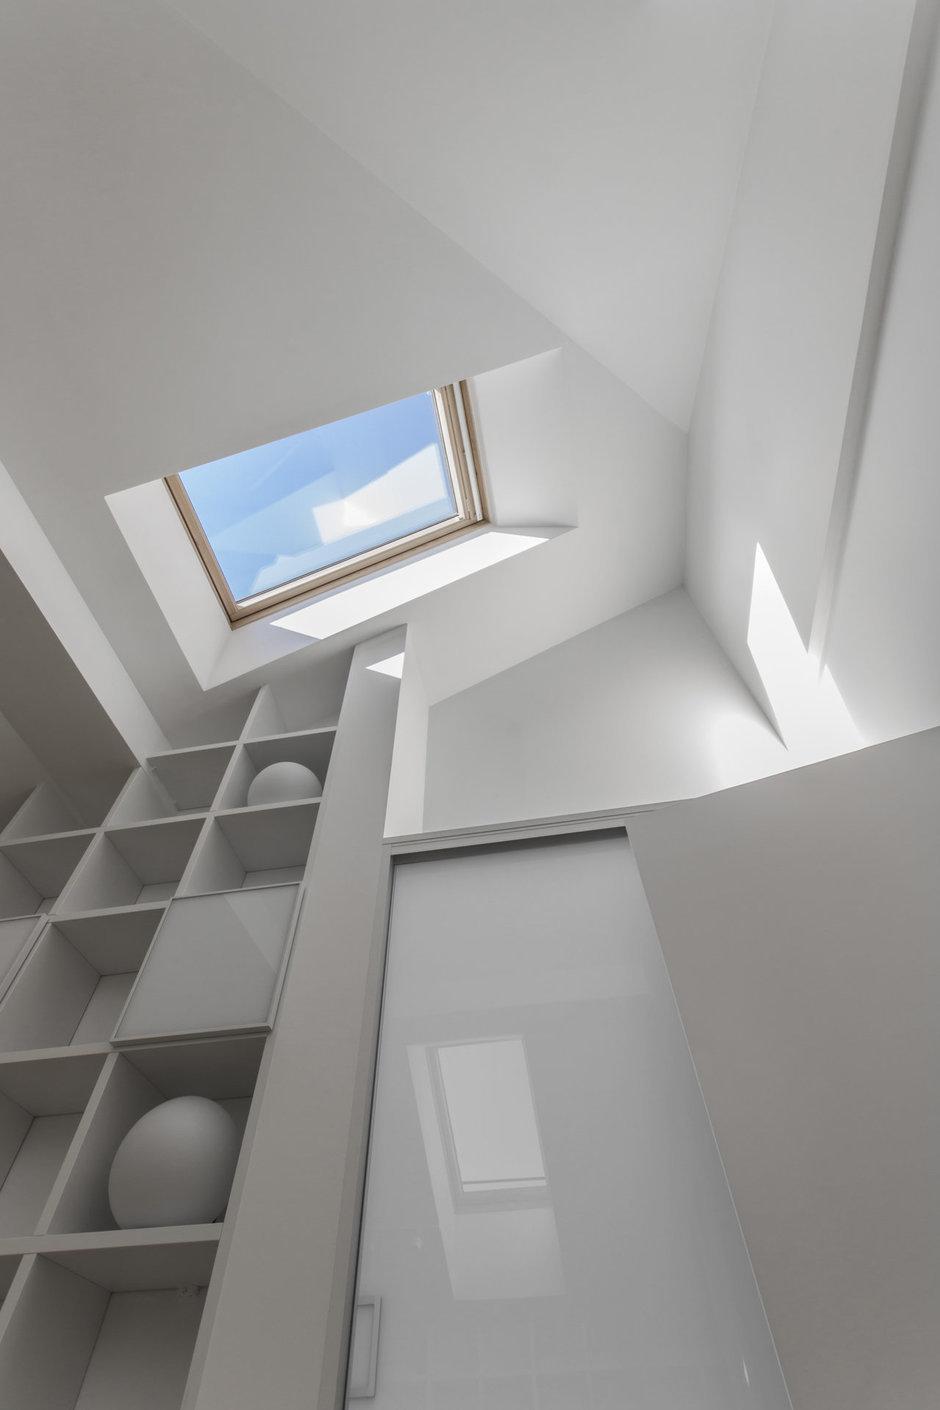 Фотография:  в стиле , Квартира, BoConcept, Дома и квартиры, Белый, IKEA, Проект недели, Мансарда – фото на InMyRoom.ru